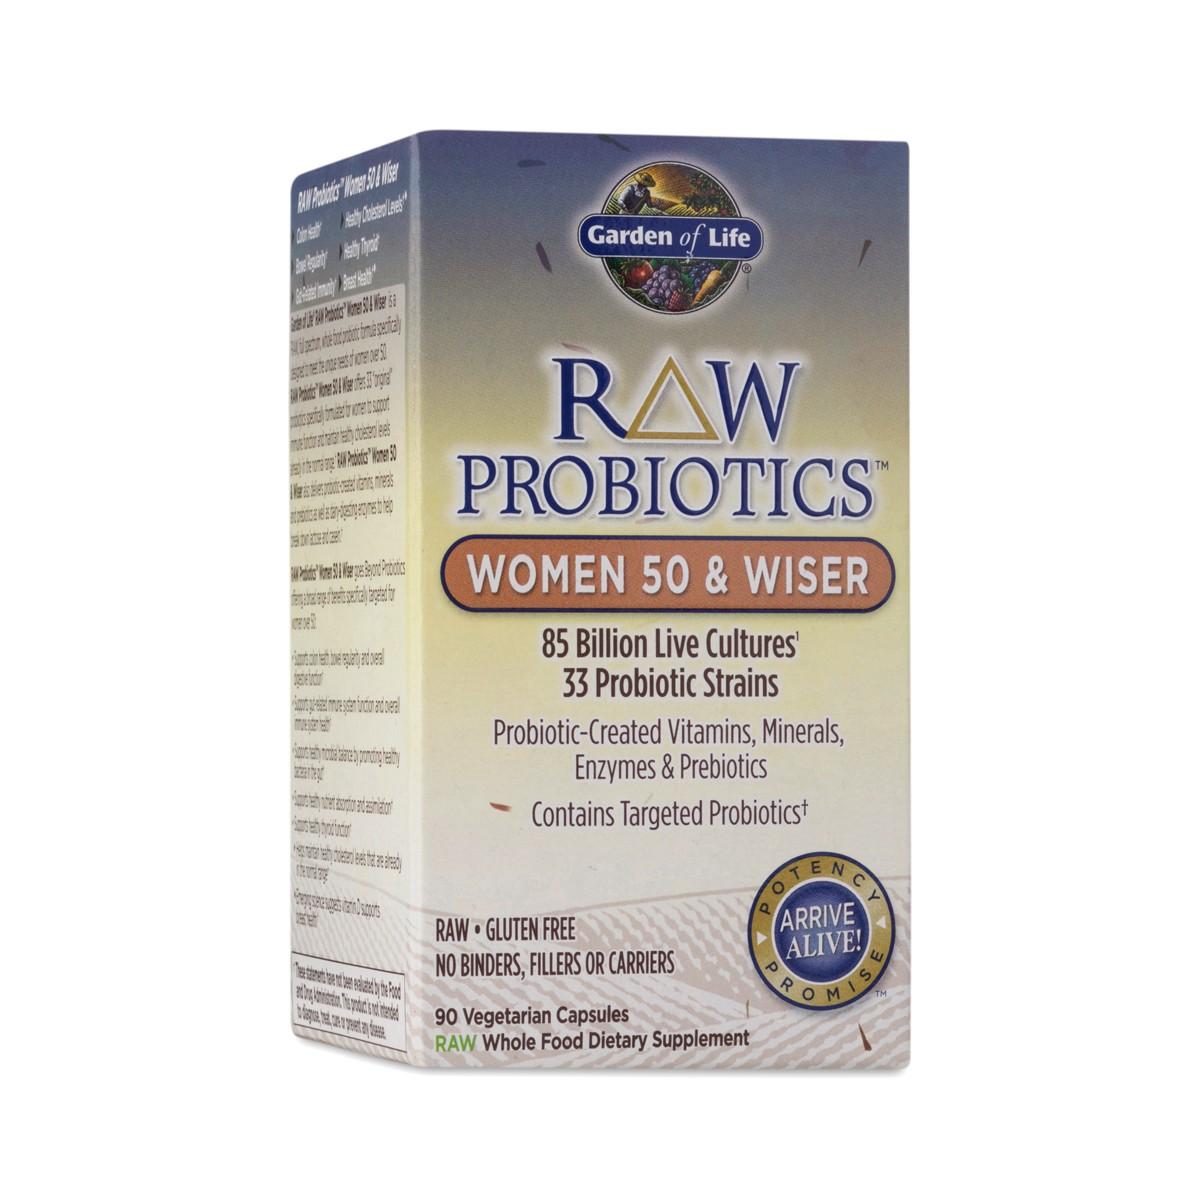 Garden of life raw probiotics women 50 wiser thrive market for Garden of life probiotics review